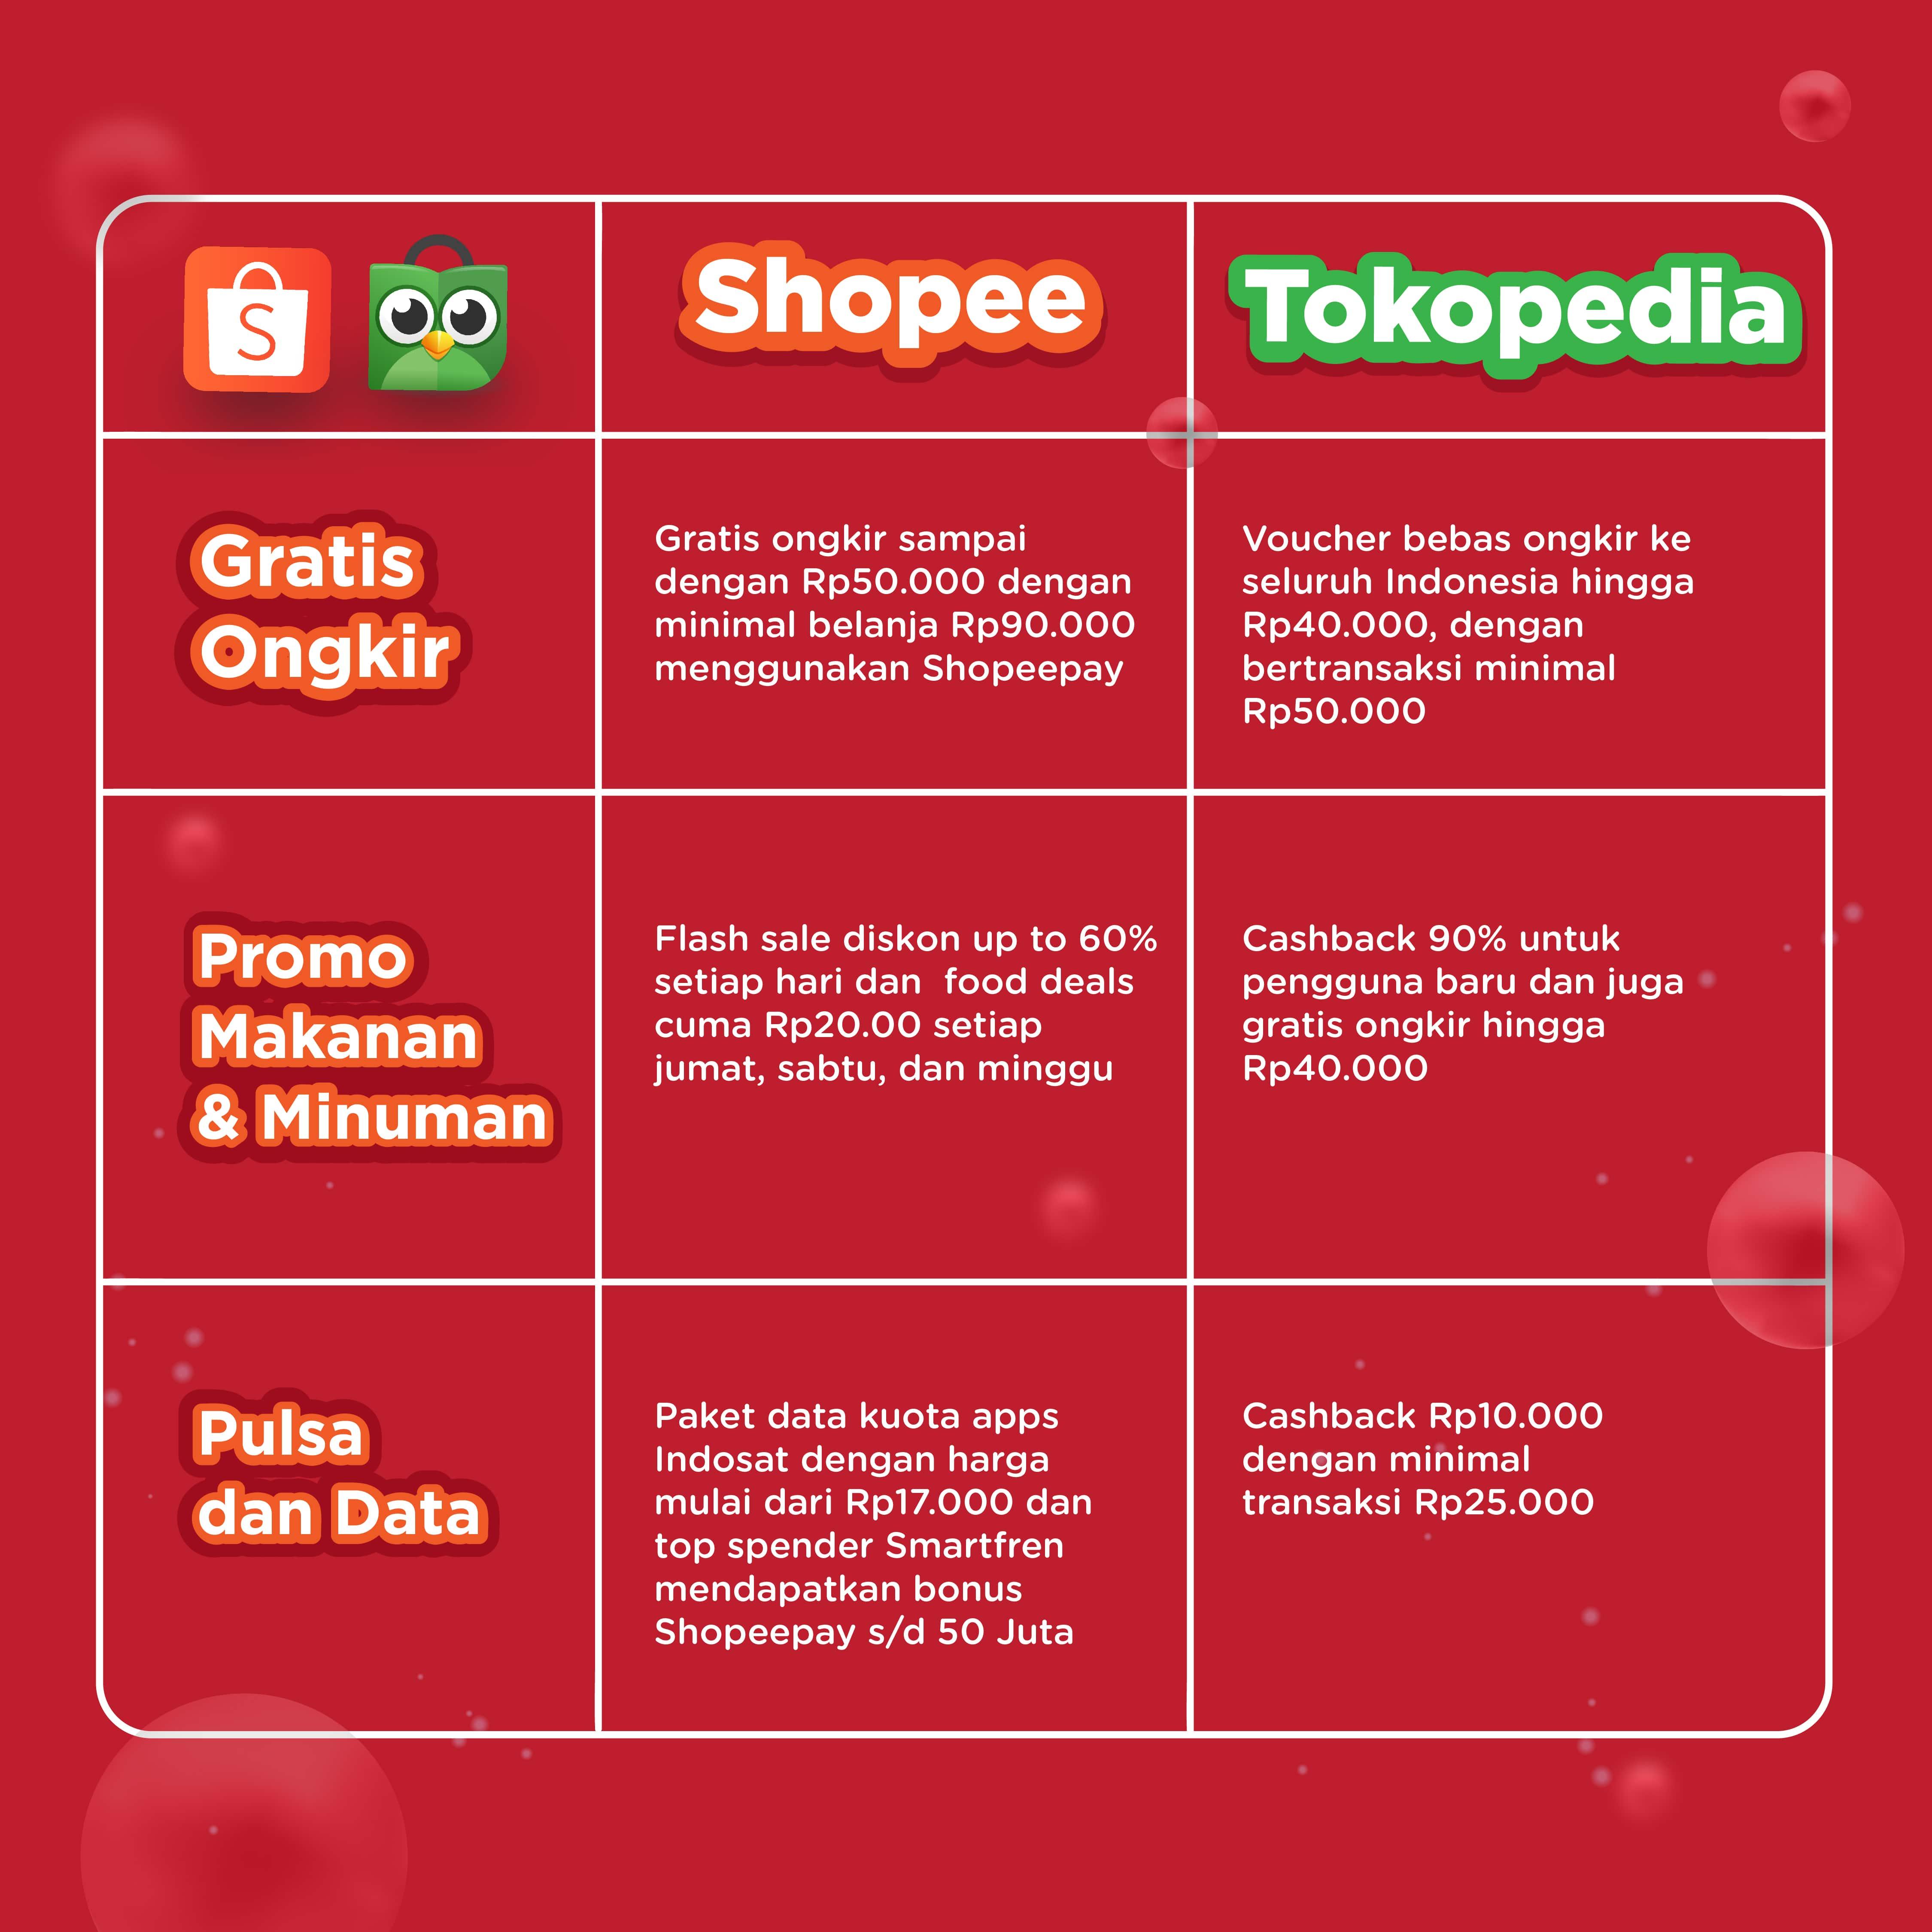 Tokopedia vs Shopee Promo